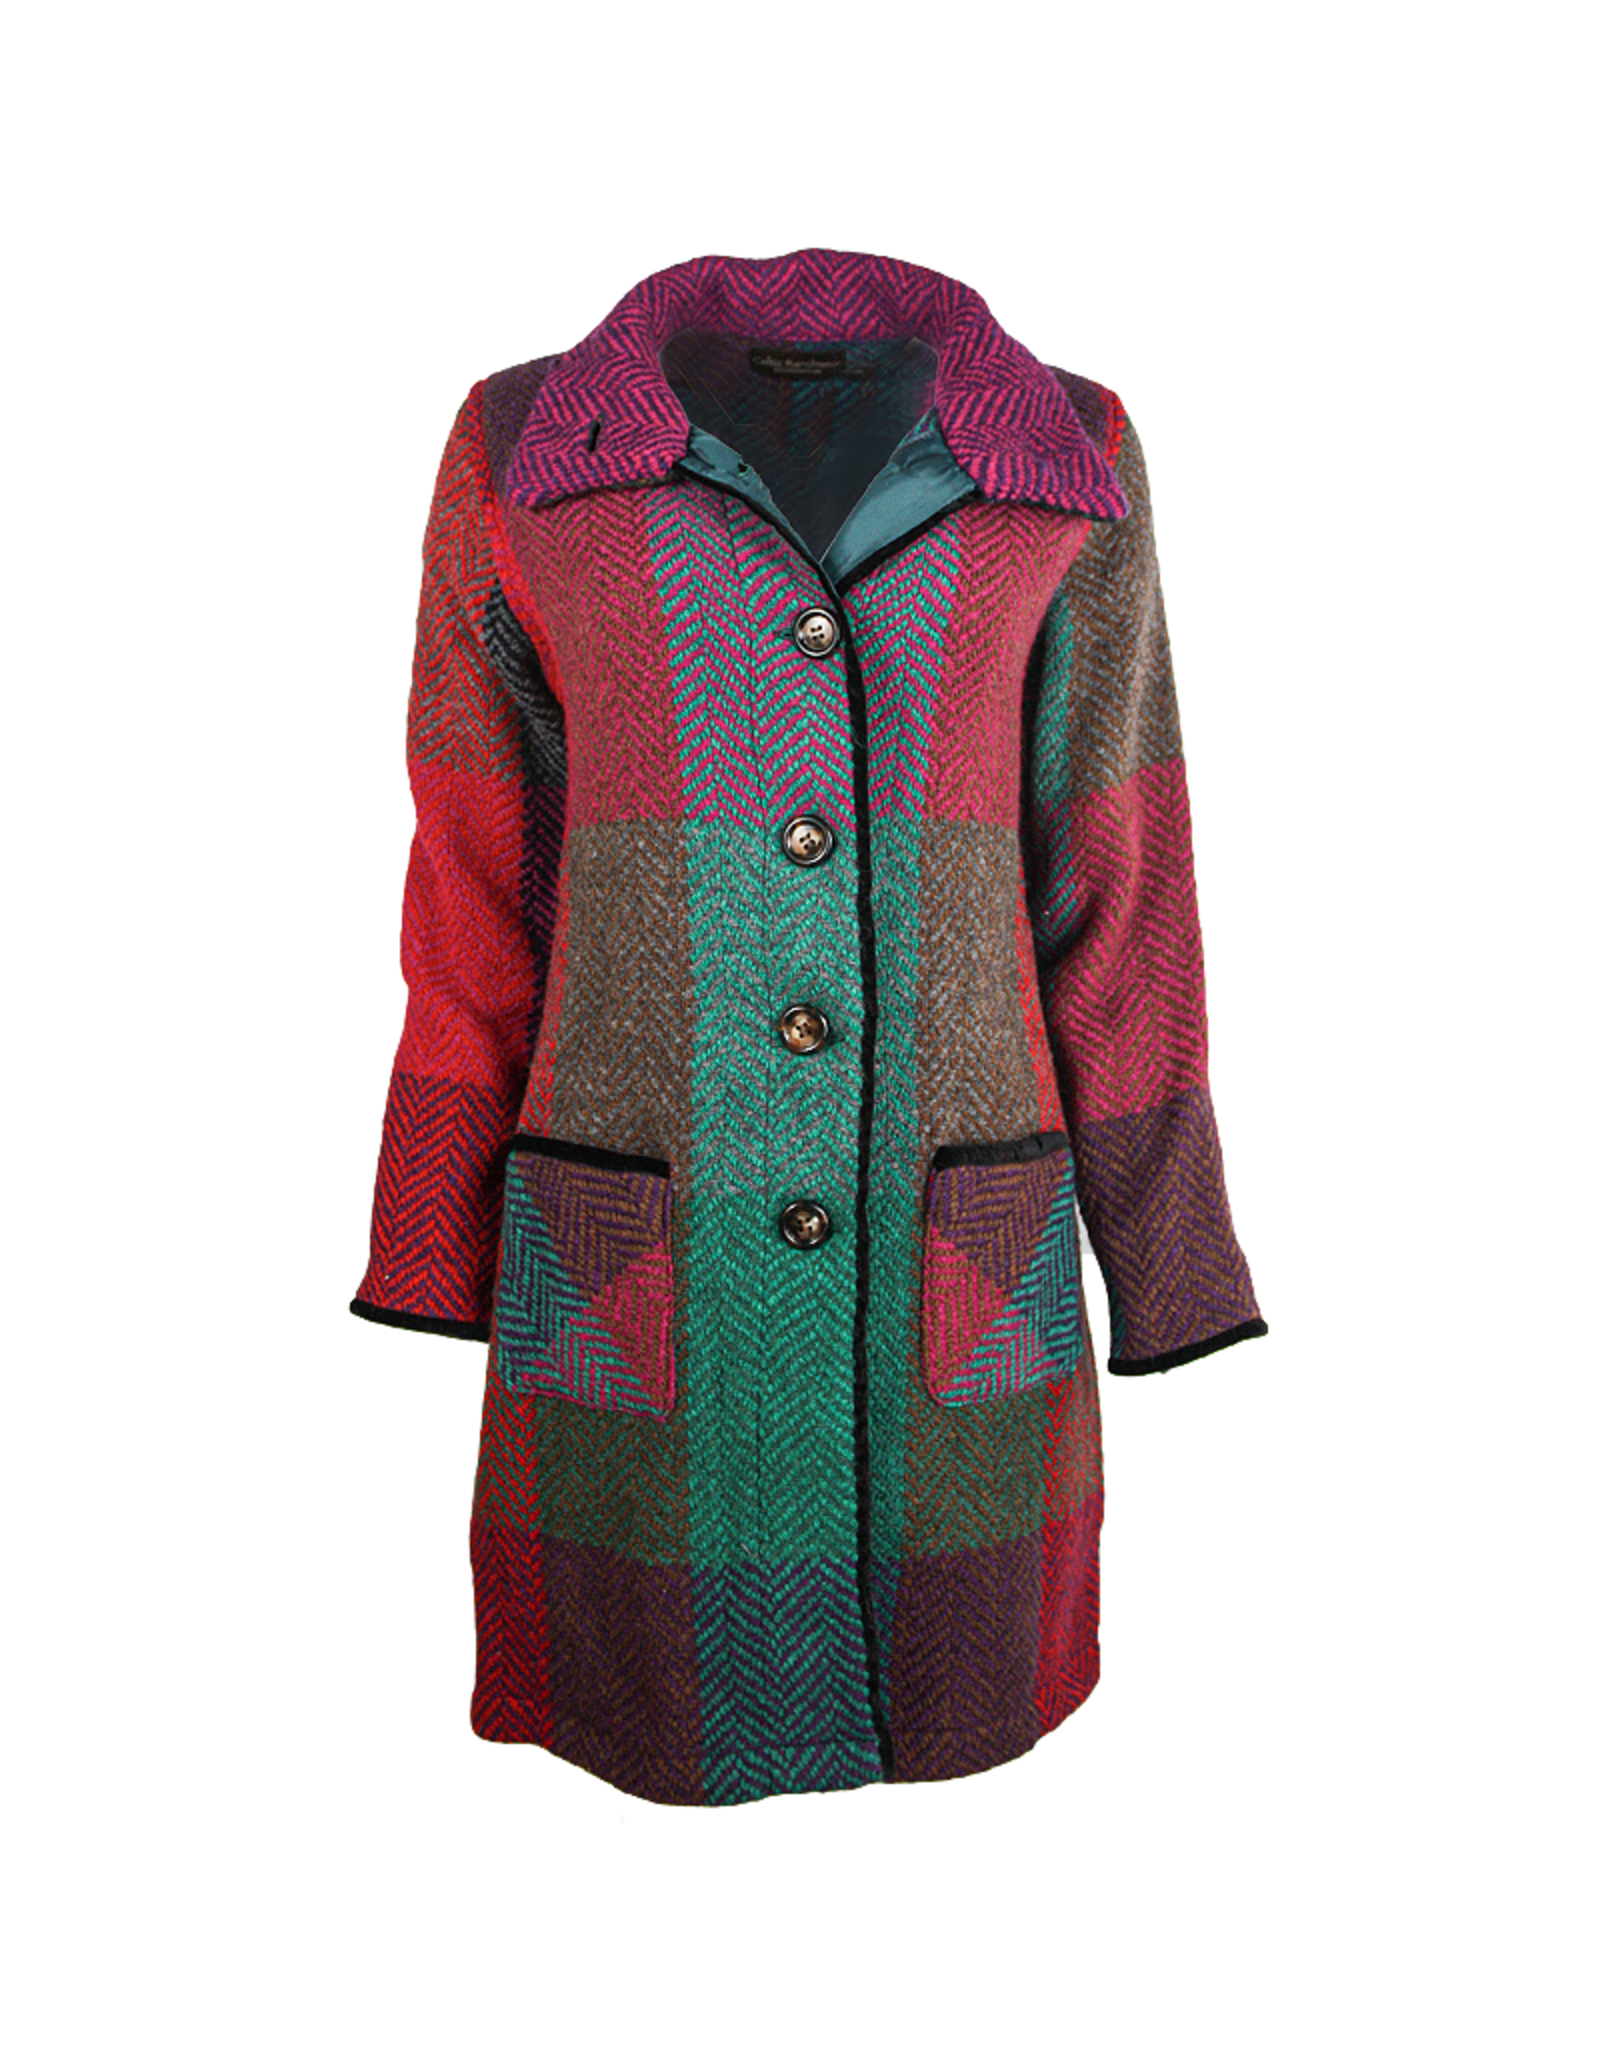 Branigan Weavers 'Emma' Donegal  Coat by Brangian Weavers